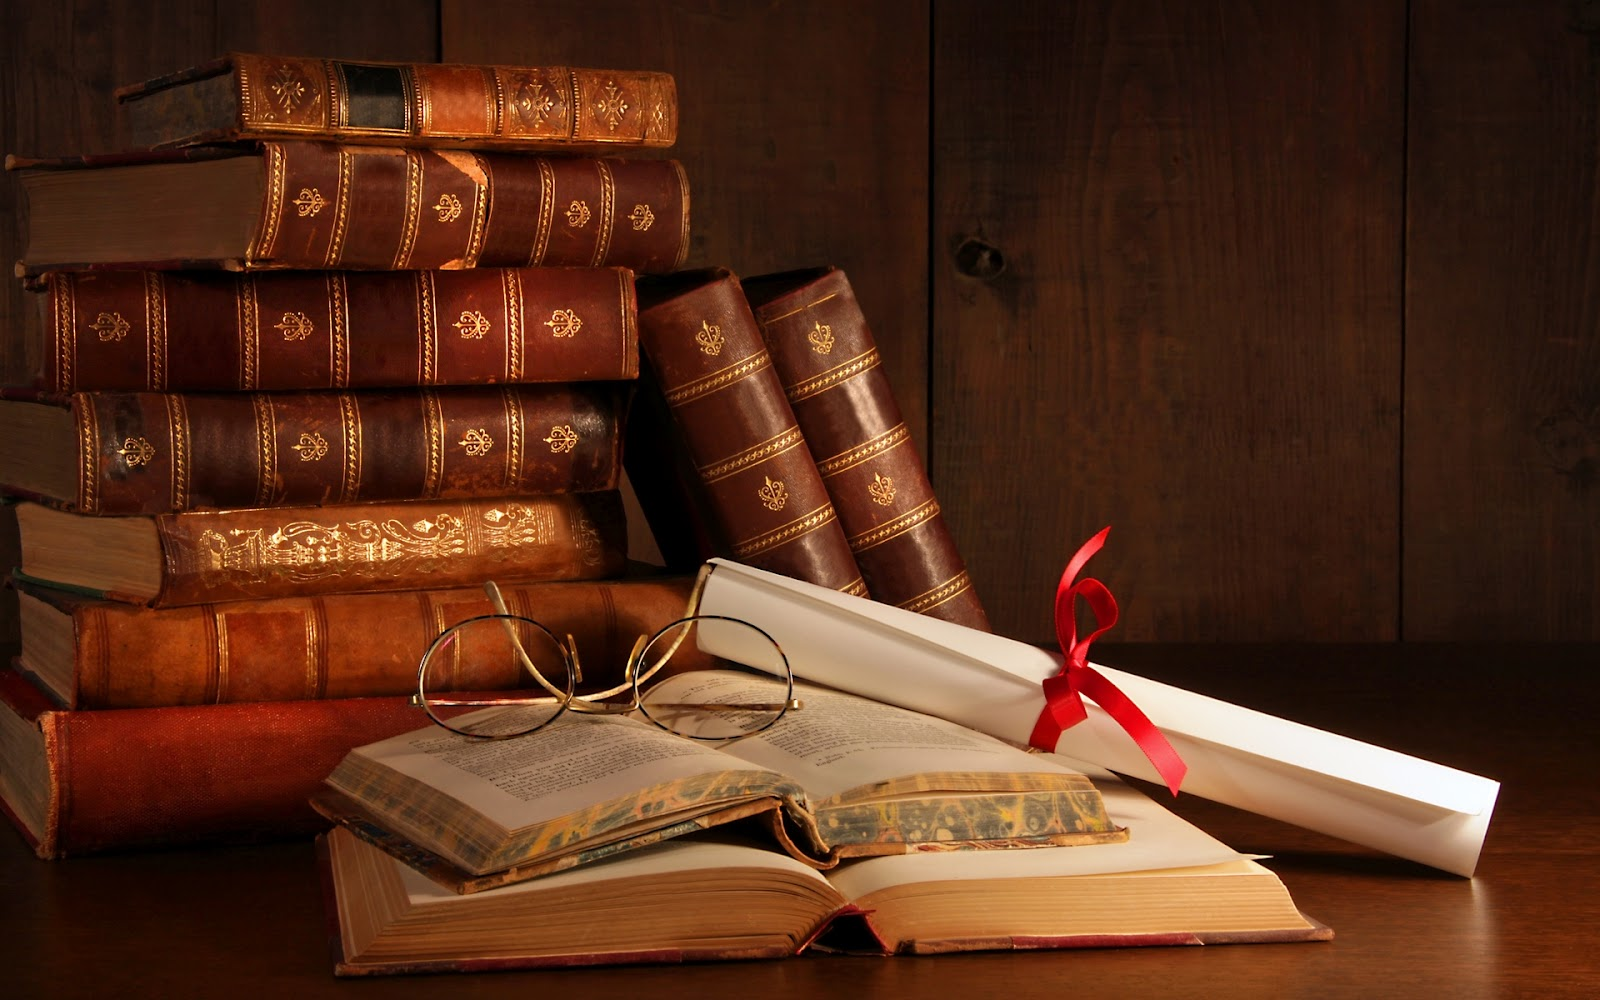 http://4.bp.blogspot.com/-yT6qOZ4UQgc/UOwbigmFq0I/AAAAAAAABEI/T7V8aUs8cwQ/s1600/Libros-Viejos-Apilados_Imagenes-de-Libros.jpg